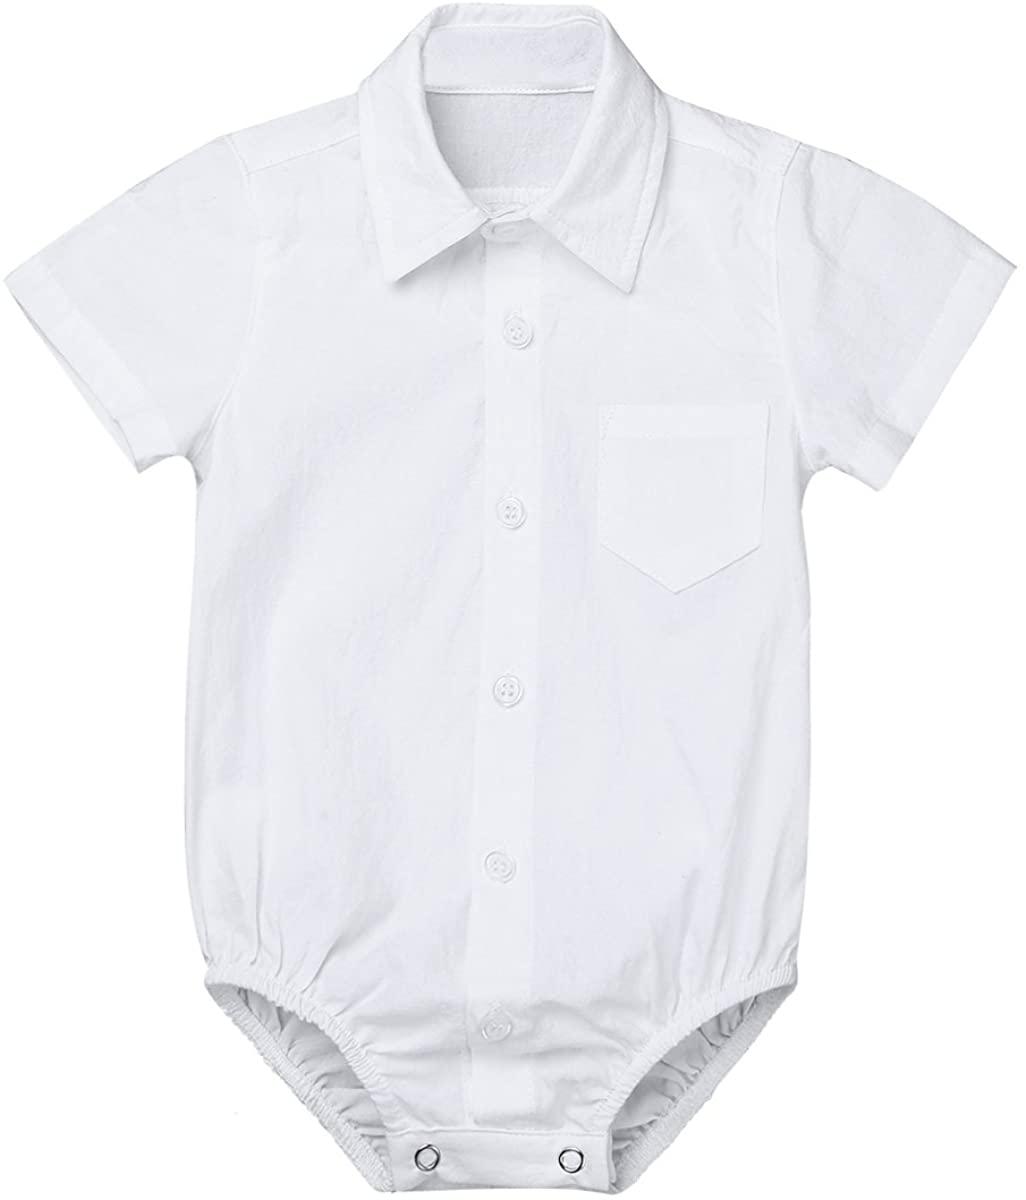 Kaerm Infant Boys Short Sleeves Formal Dress Shirt Bodysuit Gentleman Romper Wedding Party Outfits 3-24 Months